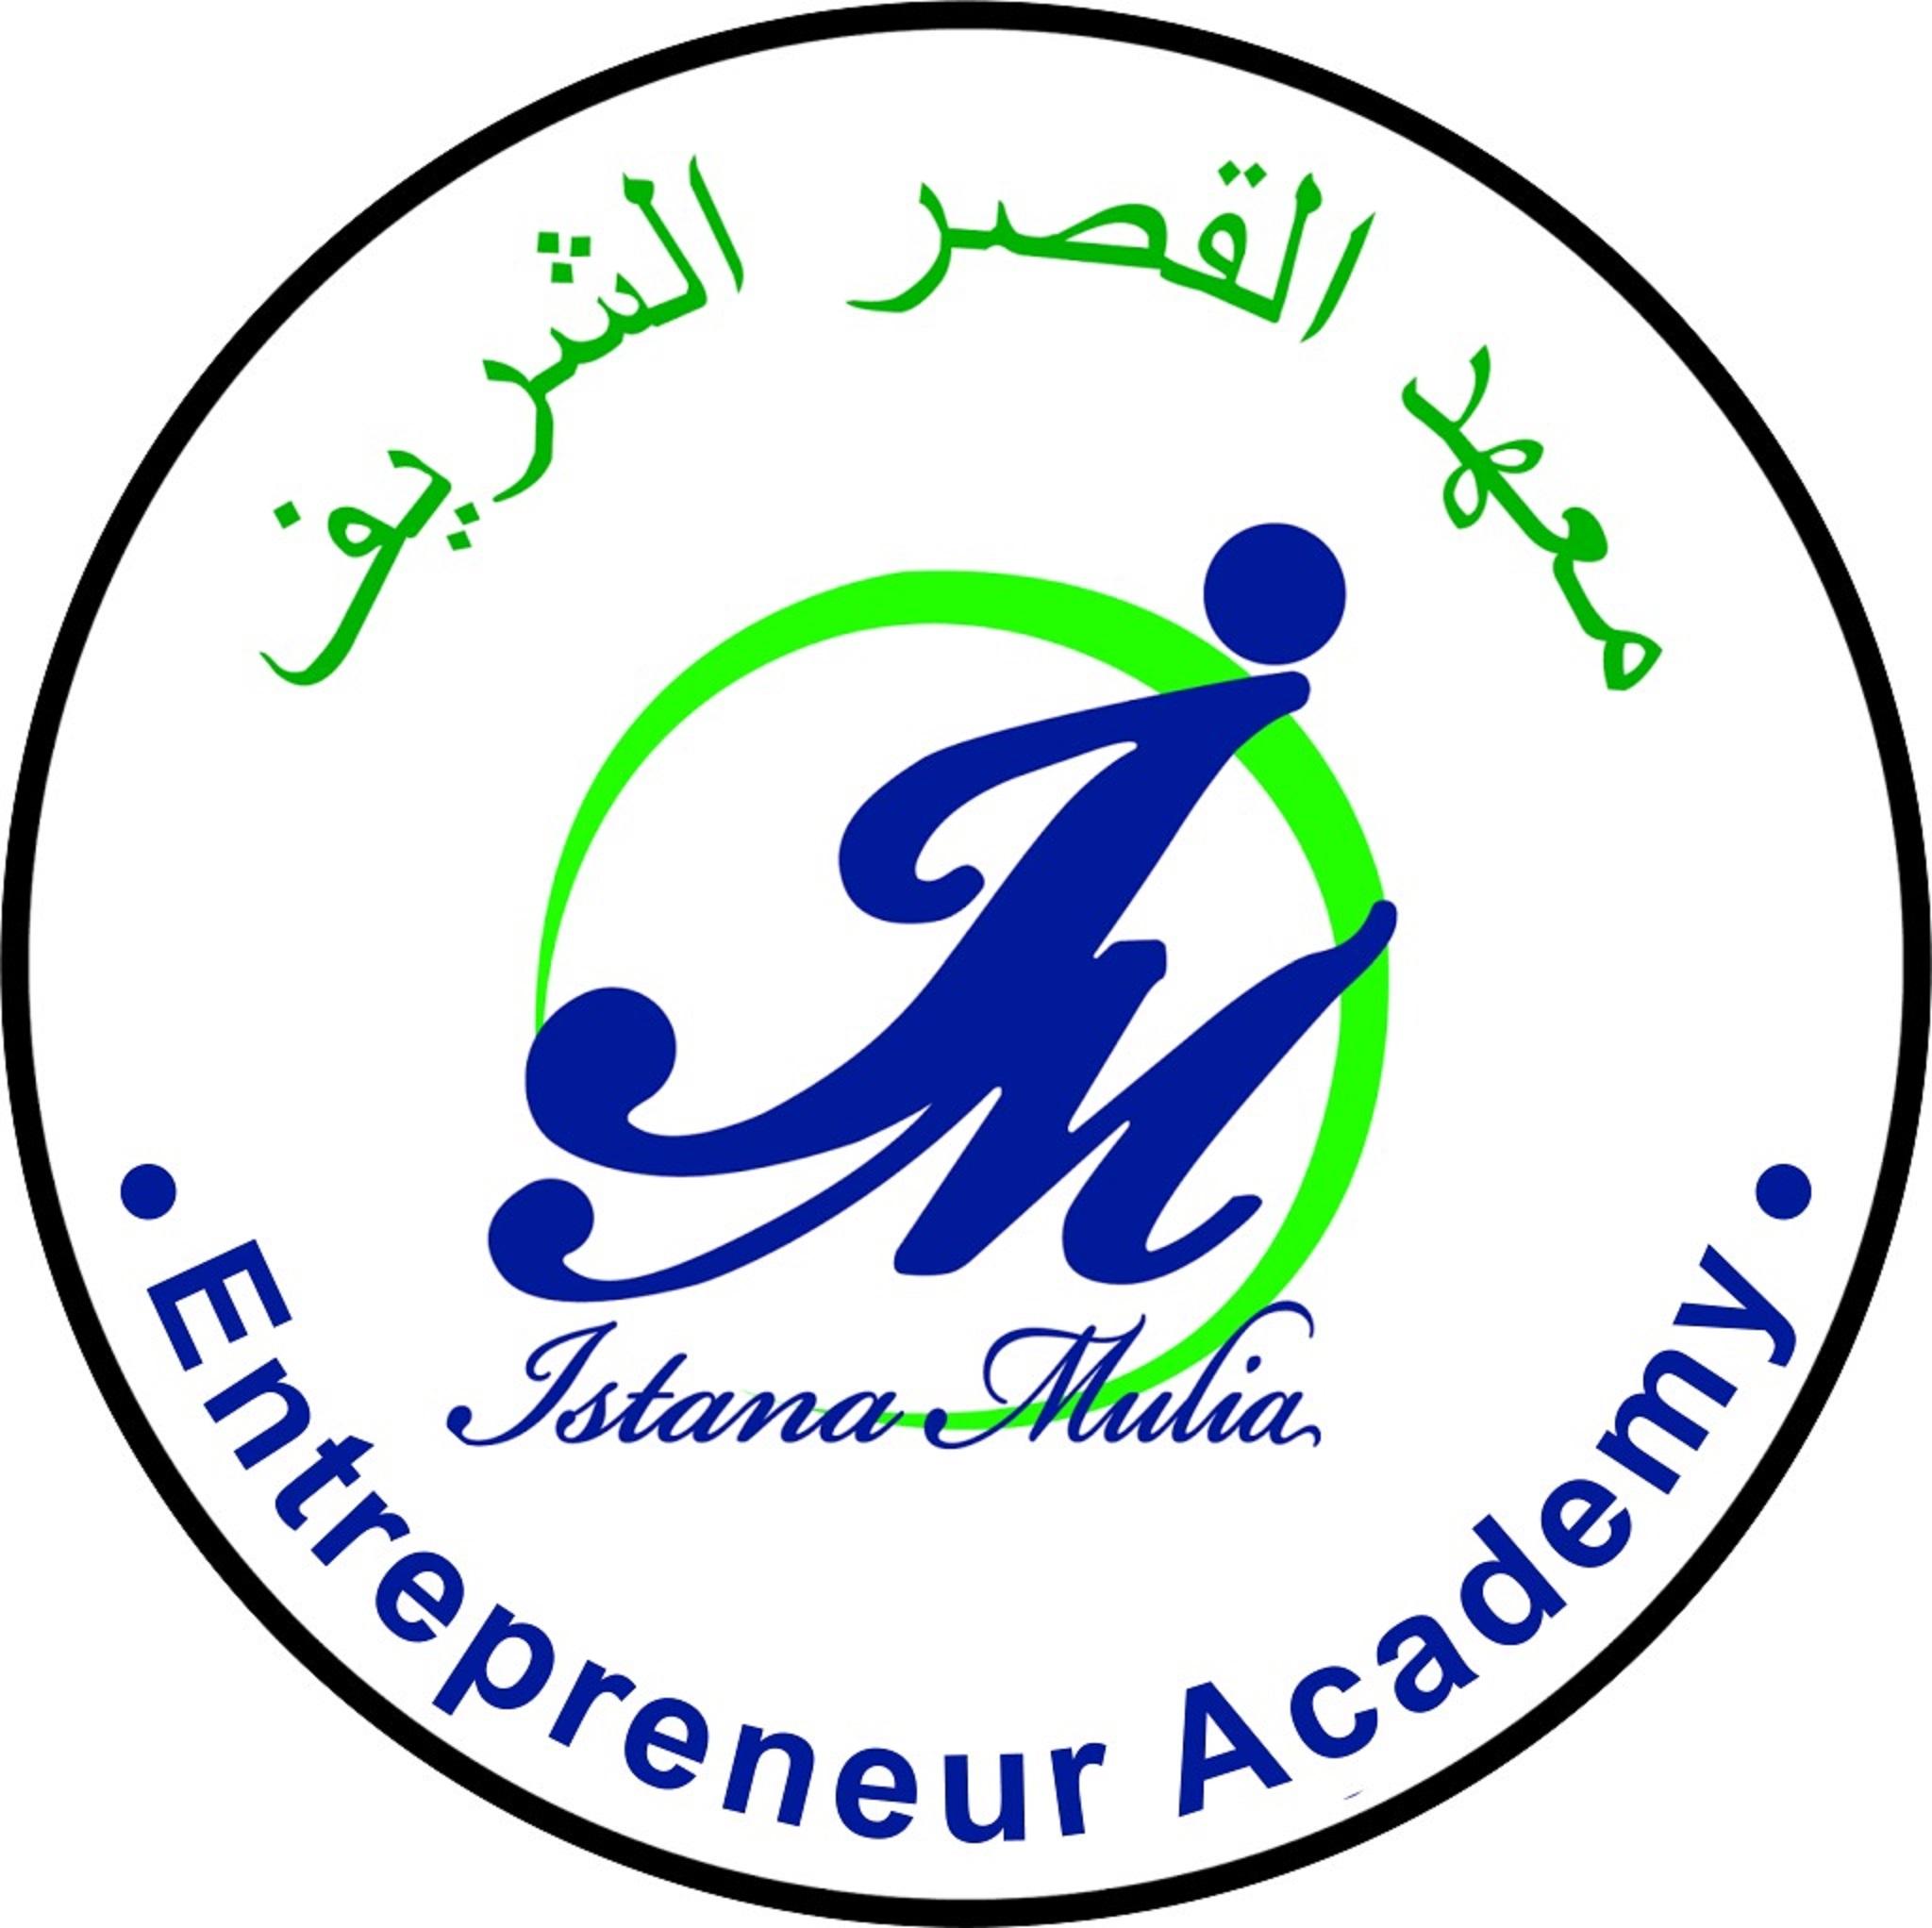 Entrepreneur Istana Mulia - Pesantri.com